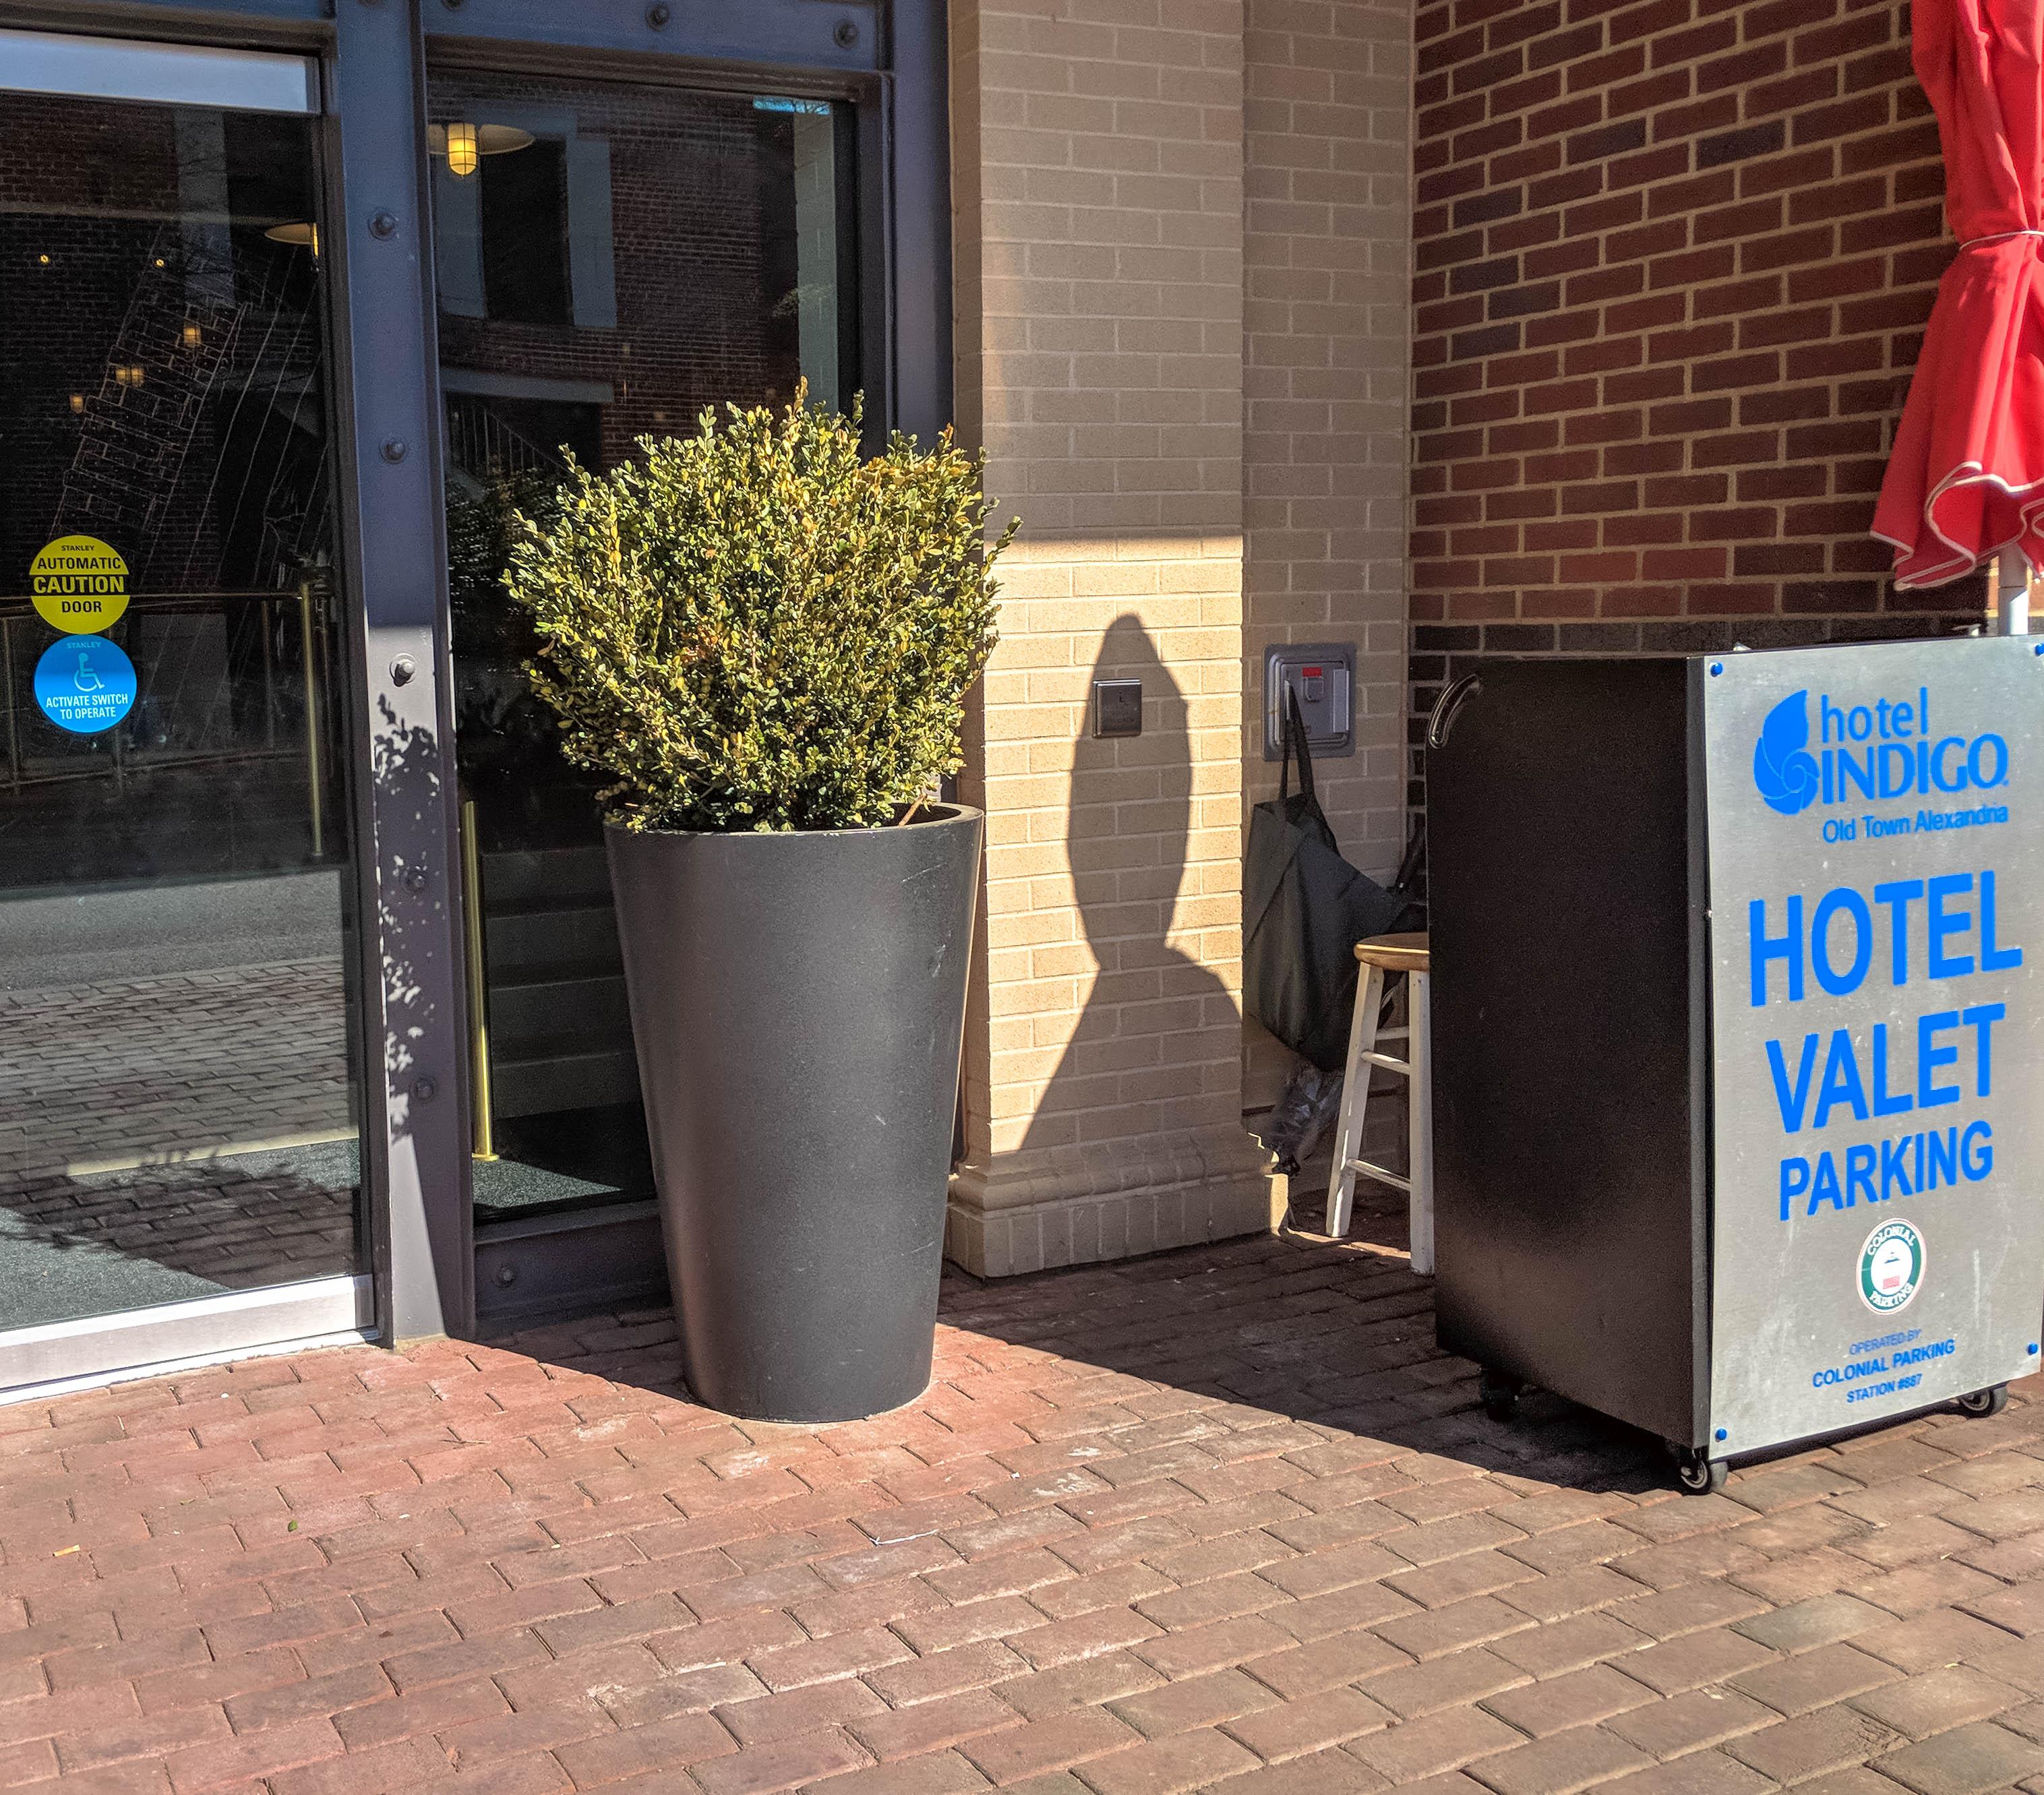 Hotel Indigo Old Alexandria Virginia Valet Parking